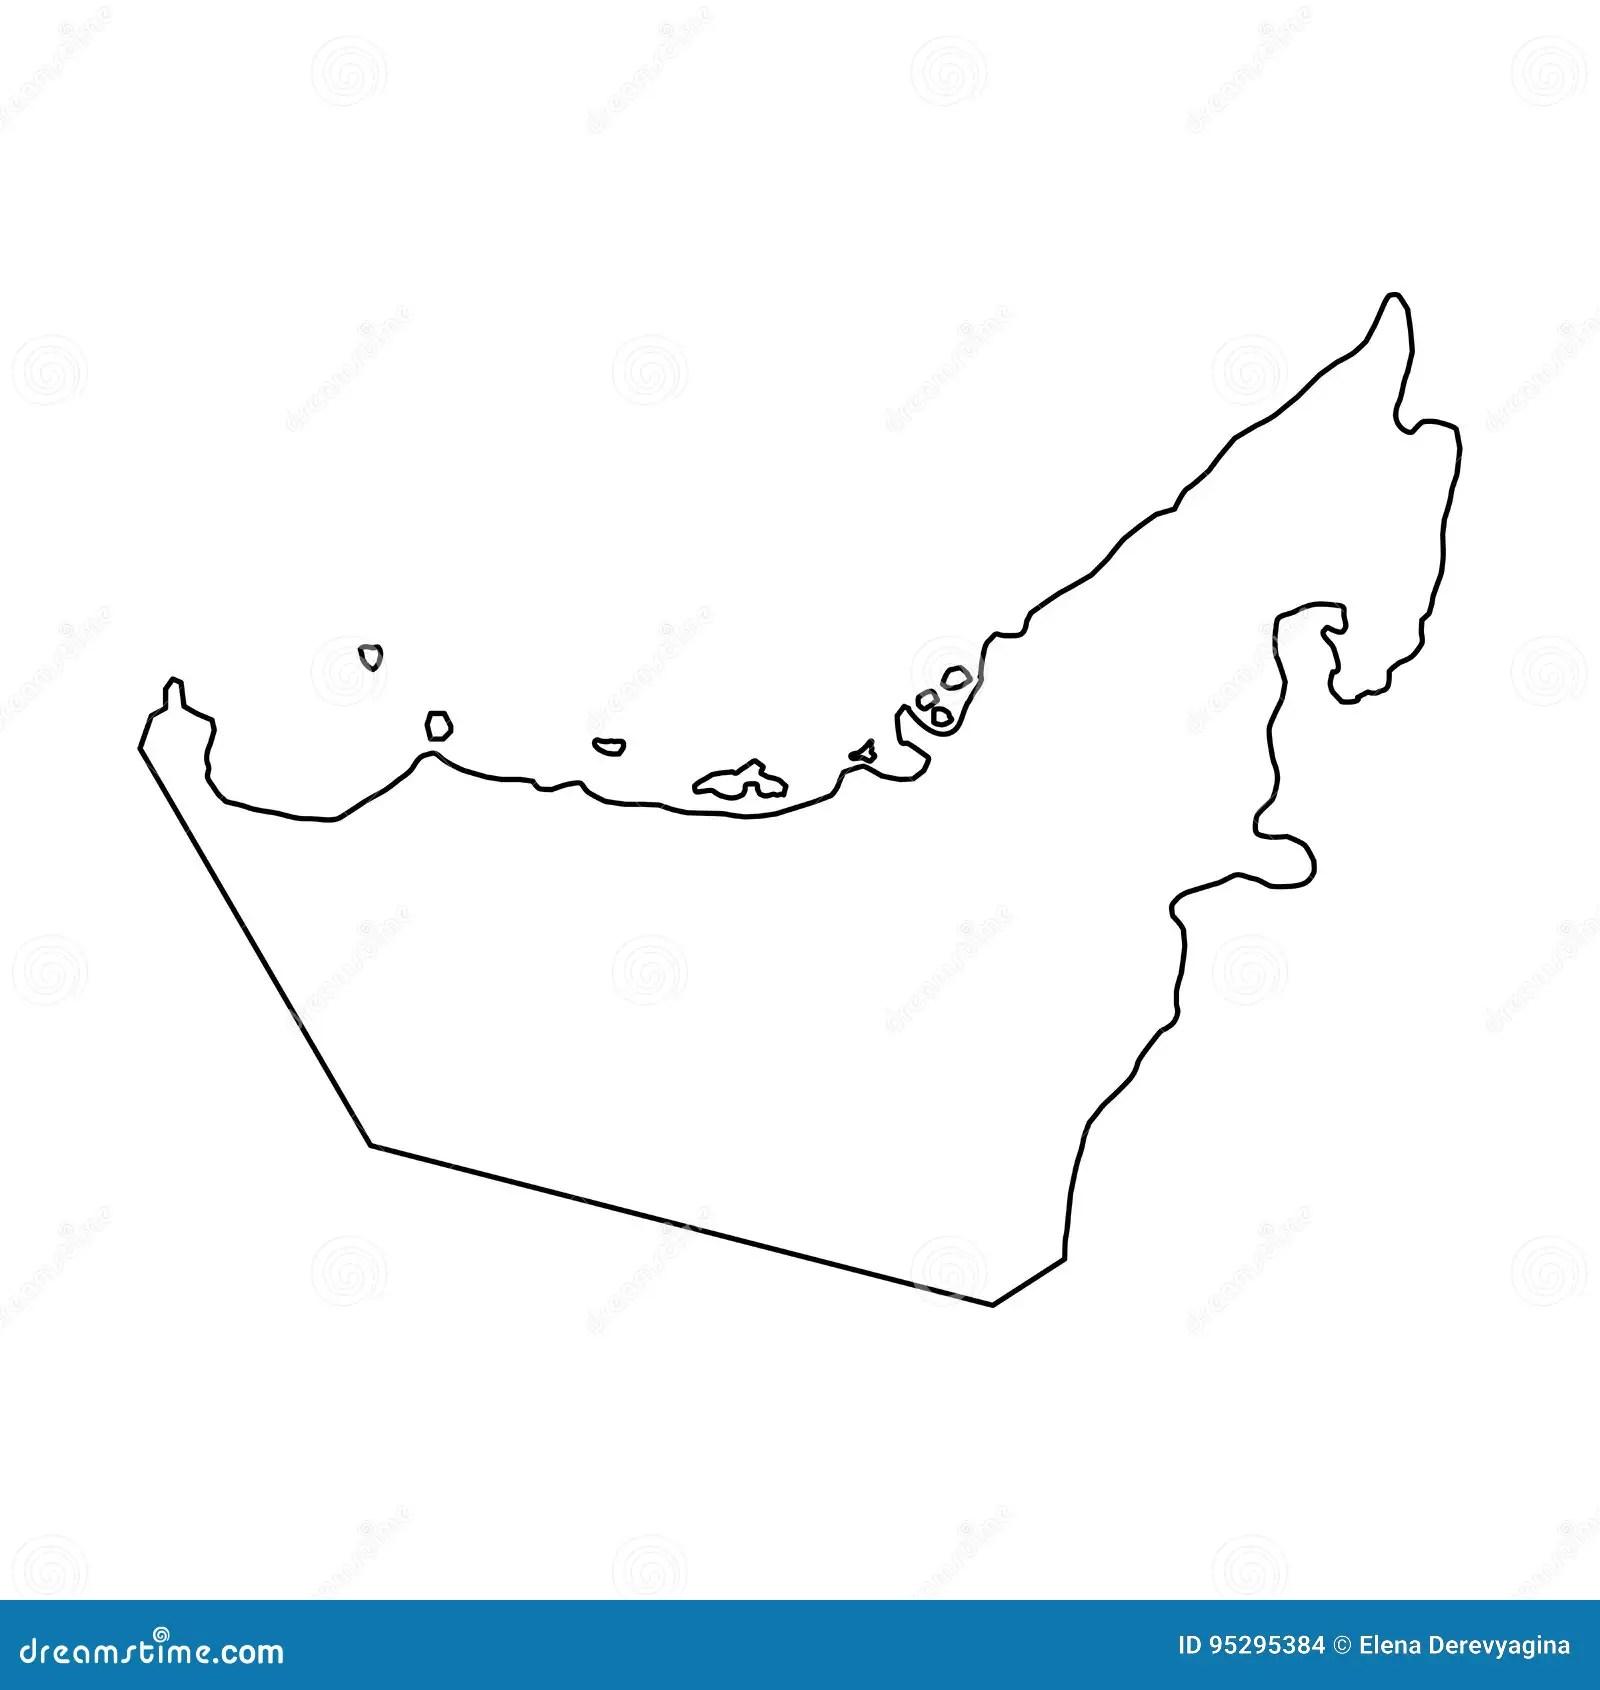 The United Arab Emirates Map Of Black Contour Curves